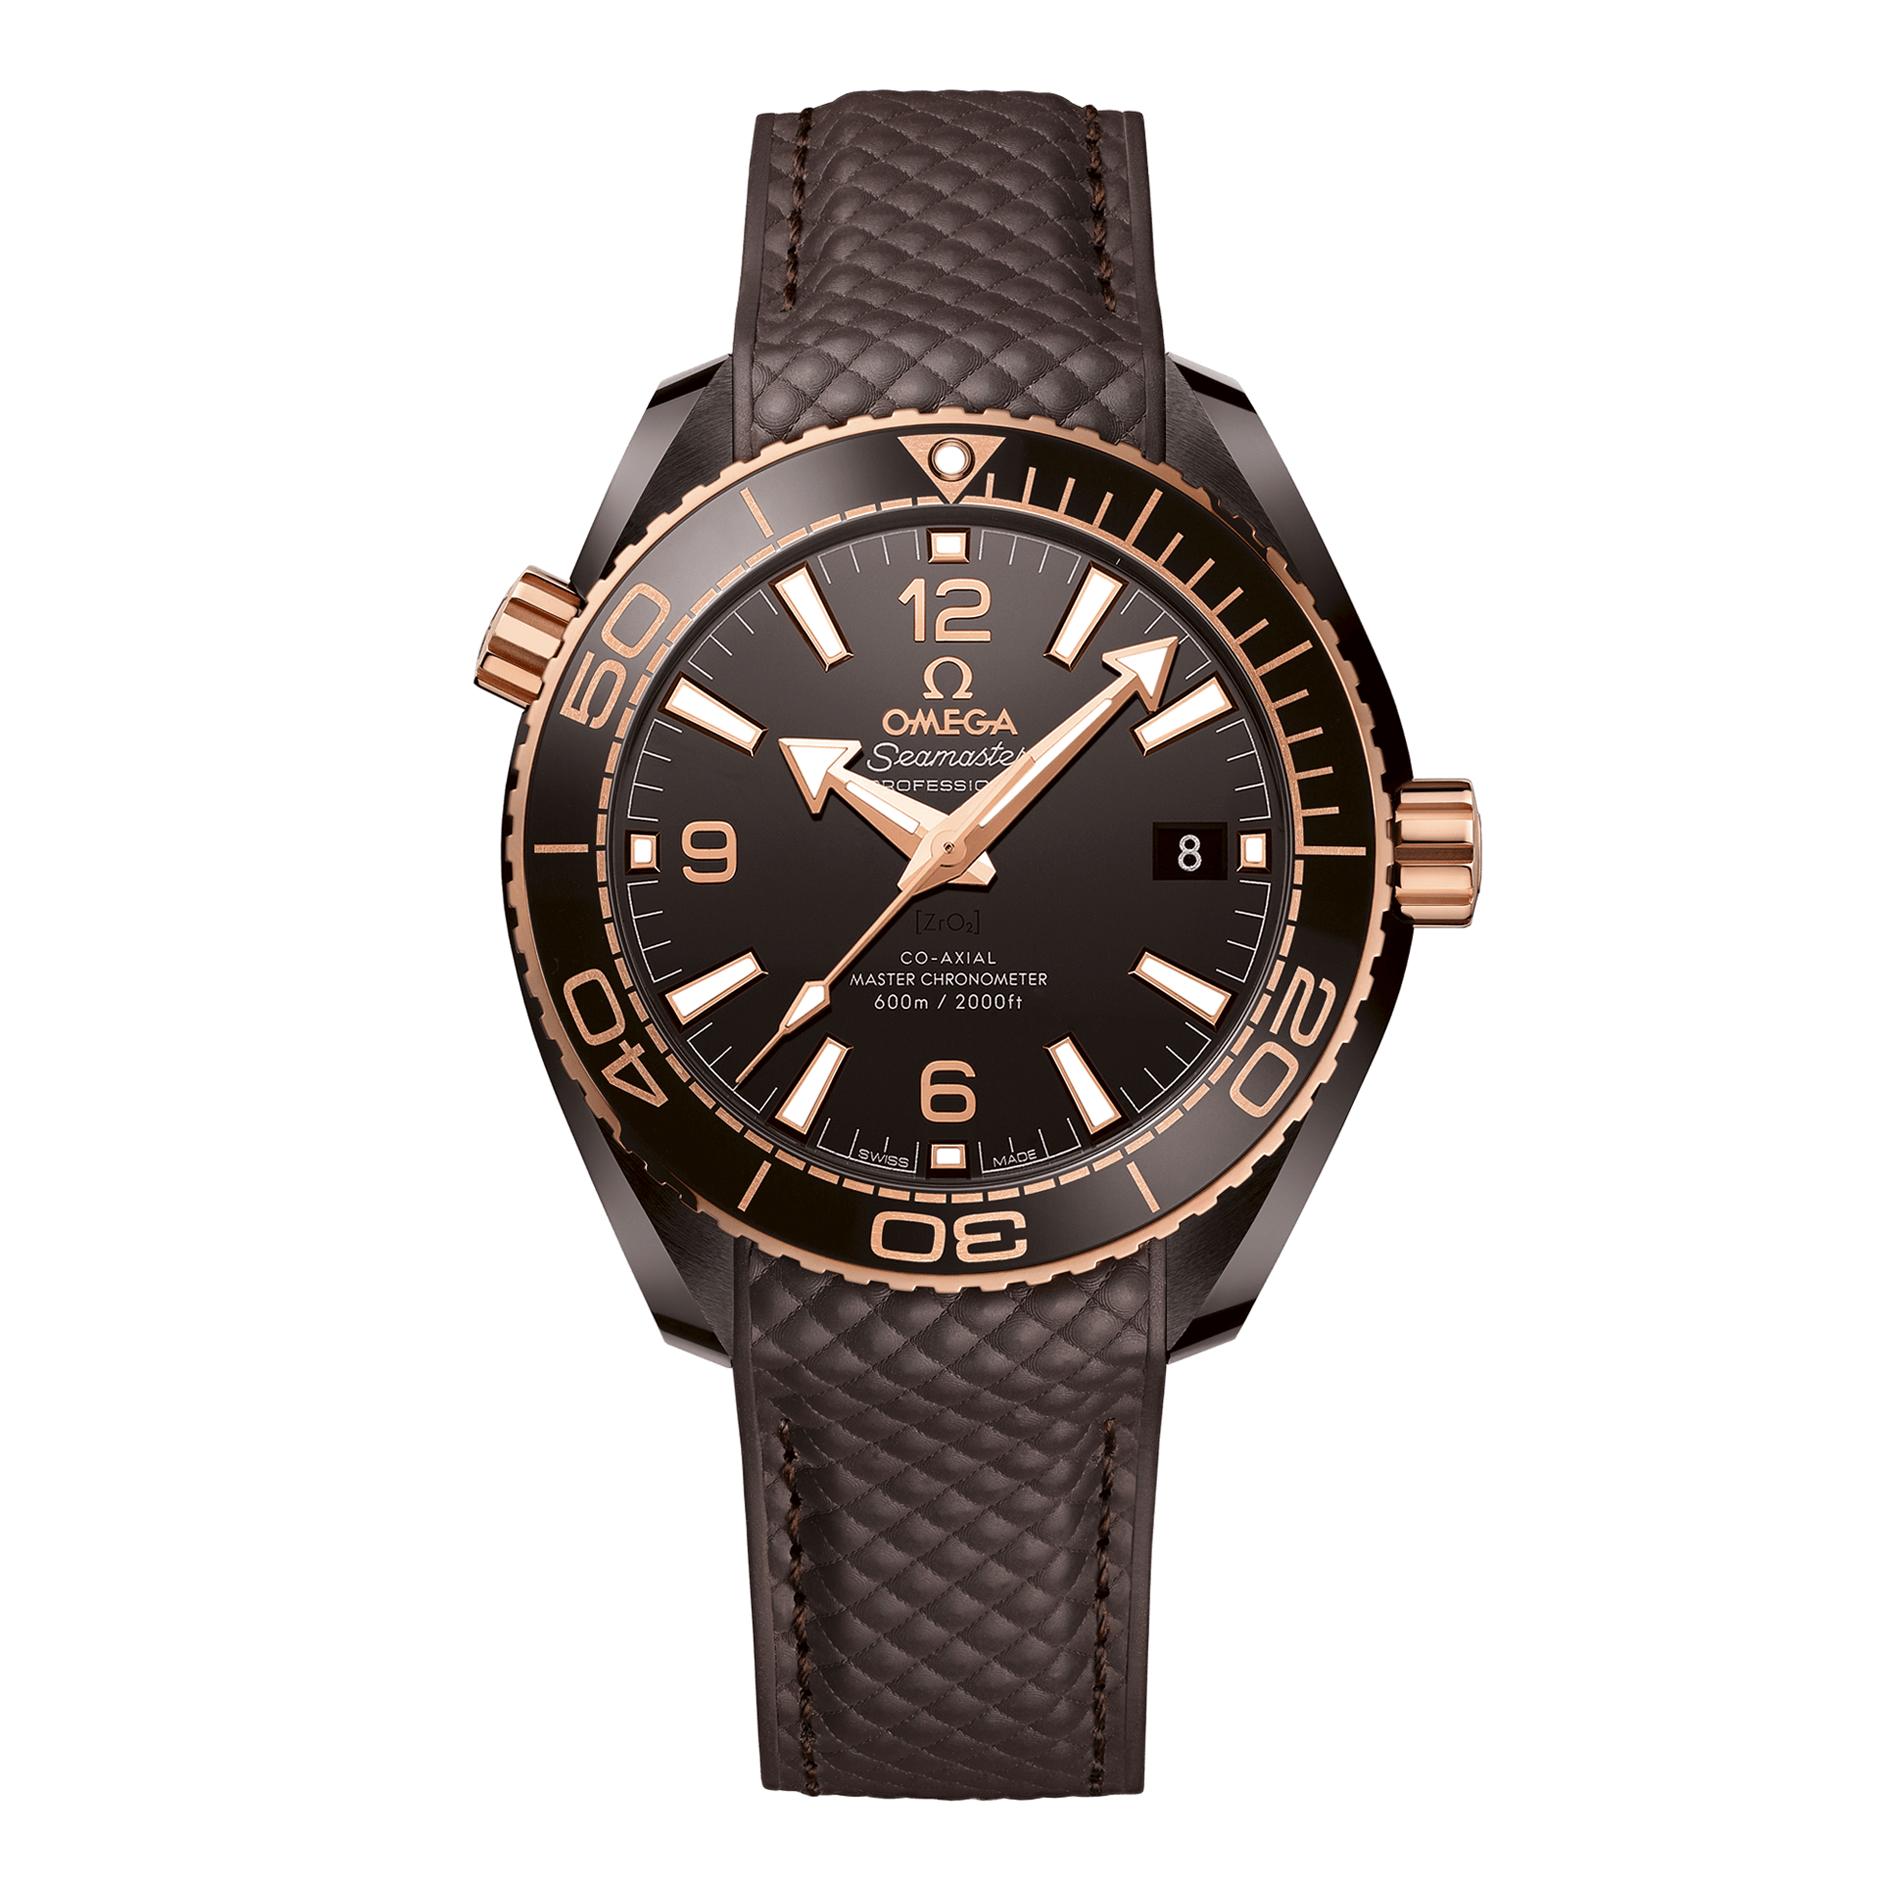 Omega - Planet Ocean 600M CoAxial Master Chronometer 39,5